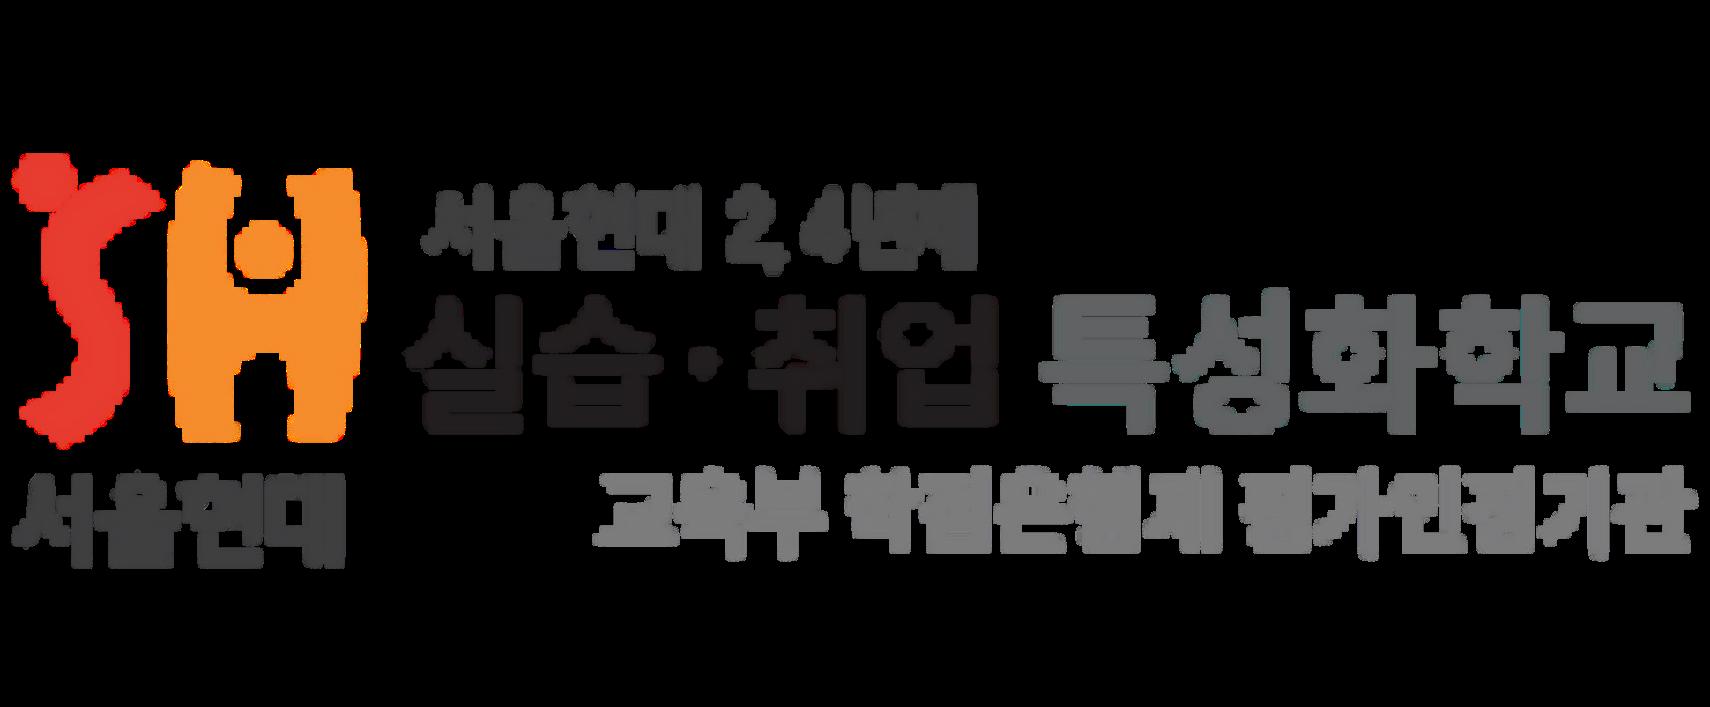 SEOUL HYUNDAI VOCATIONAL INSTITUTE